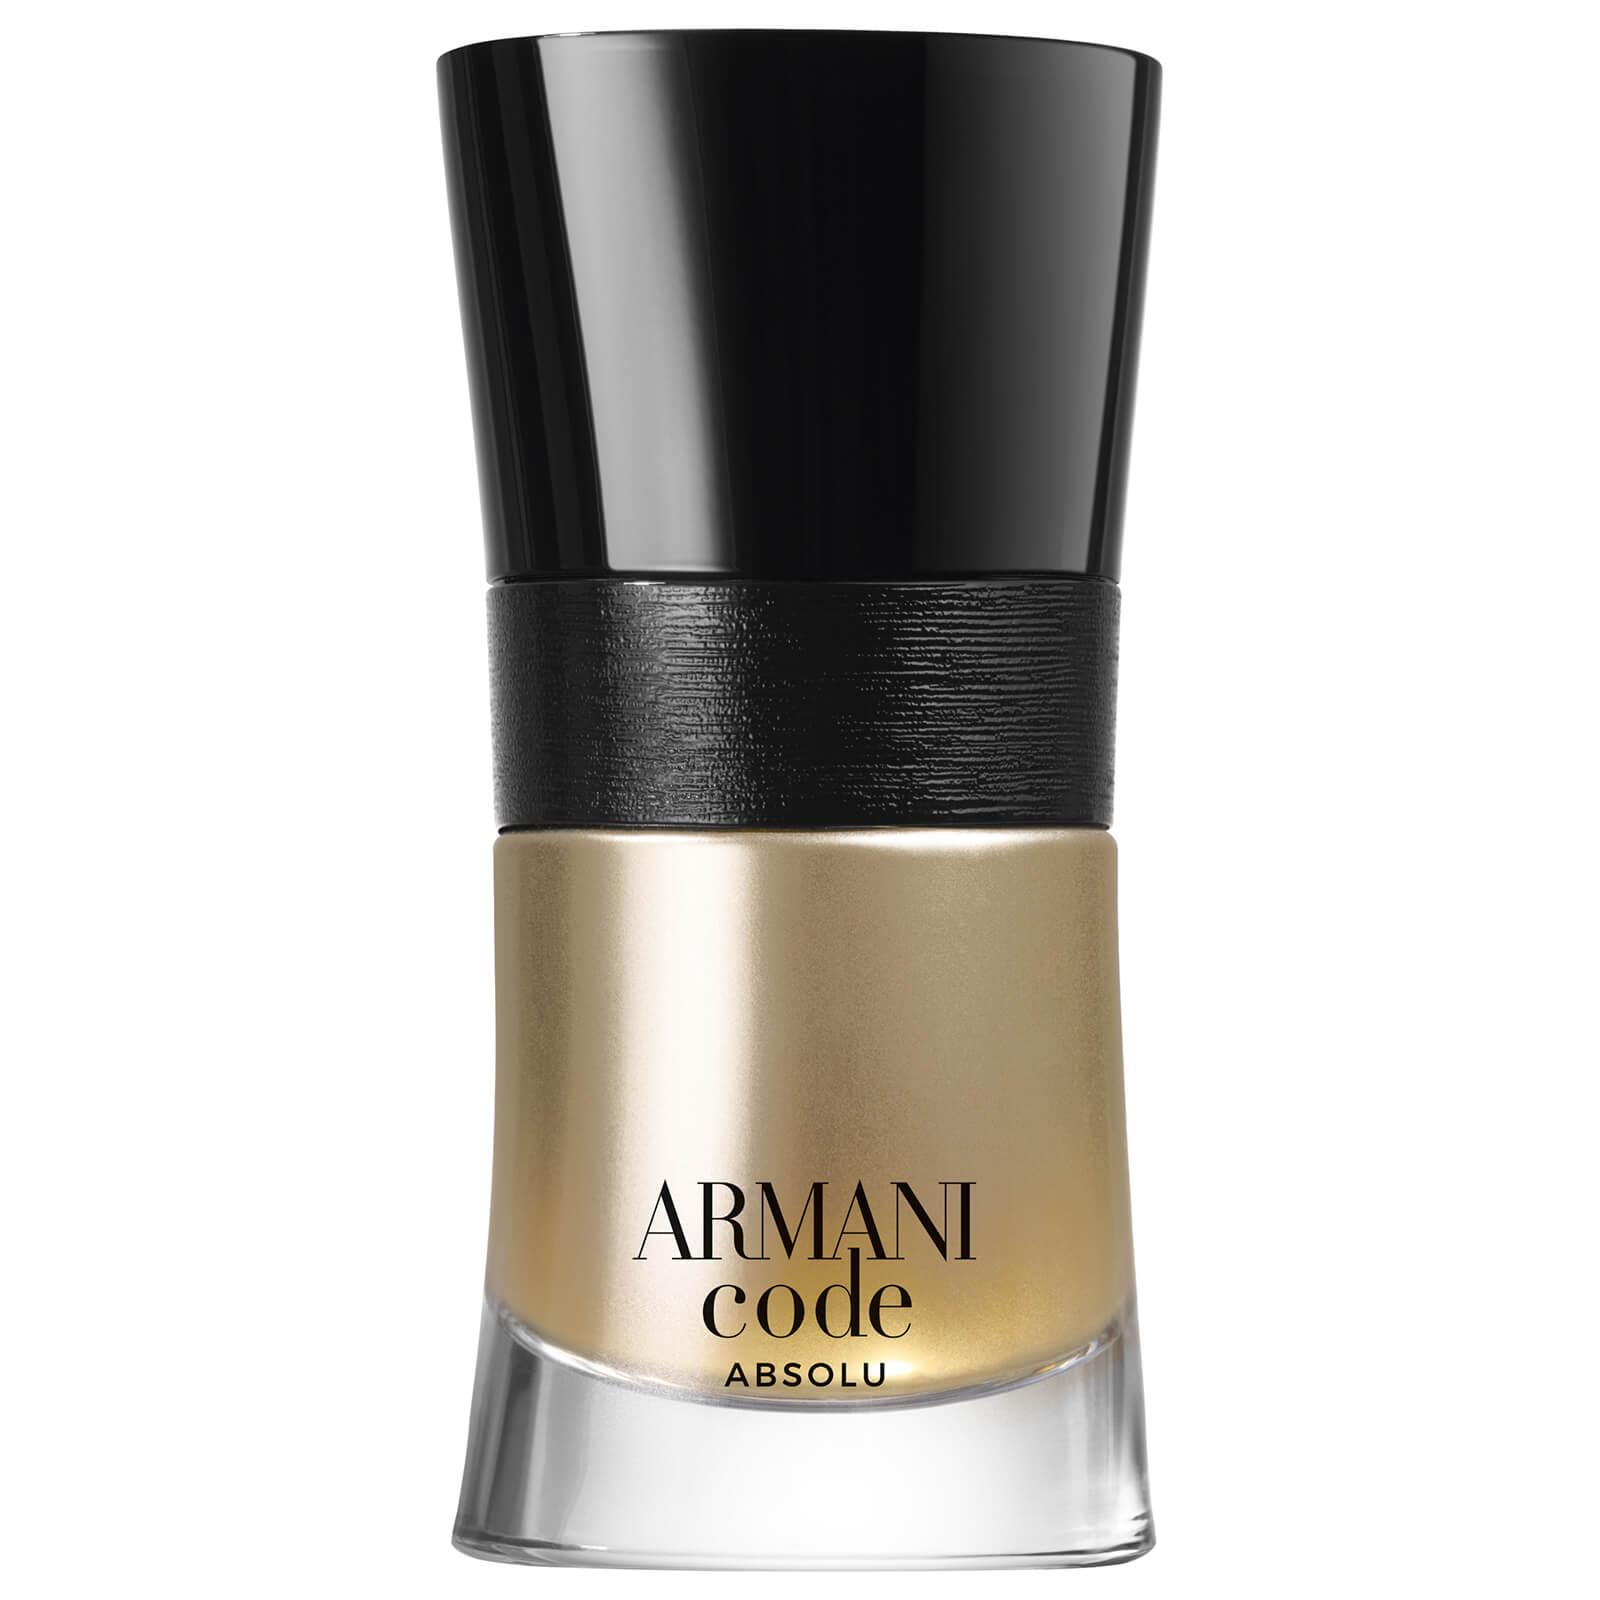 Armani Code Absolu Parfum for Men (Various Sizes) - 30ml